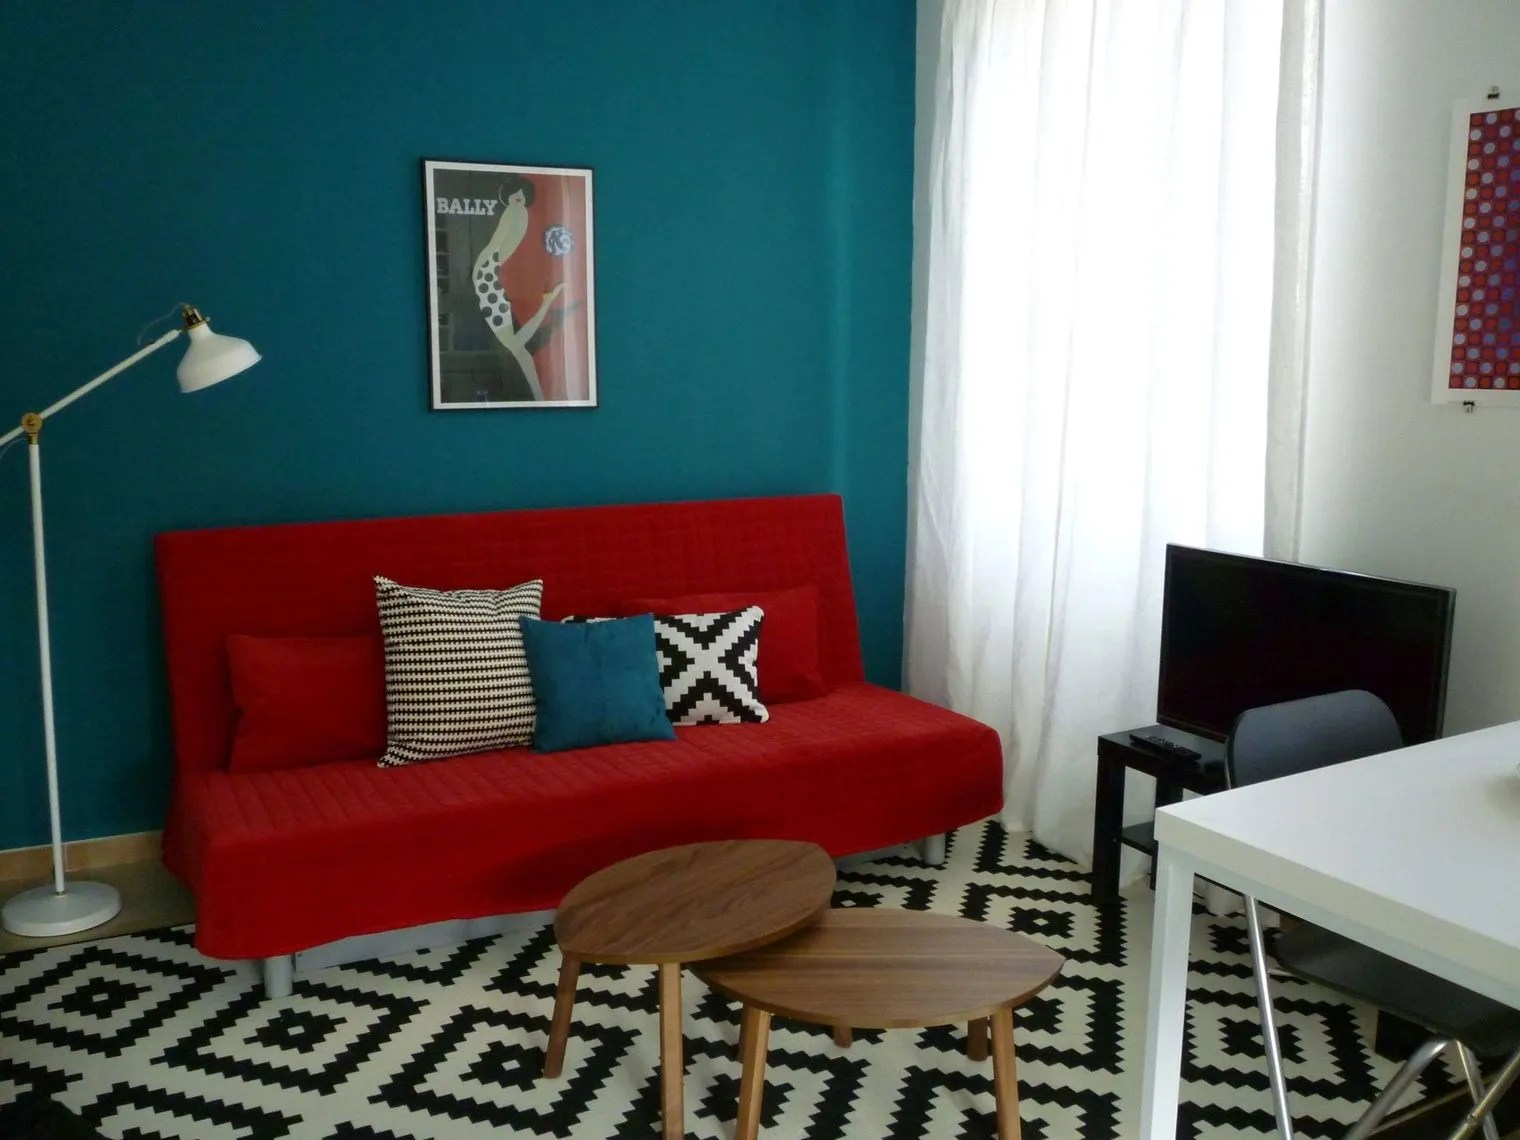 Charmant Awesome Chambre Bleu Canard Et Rouge Ideas House Design